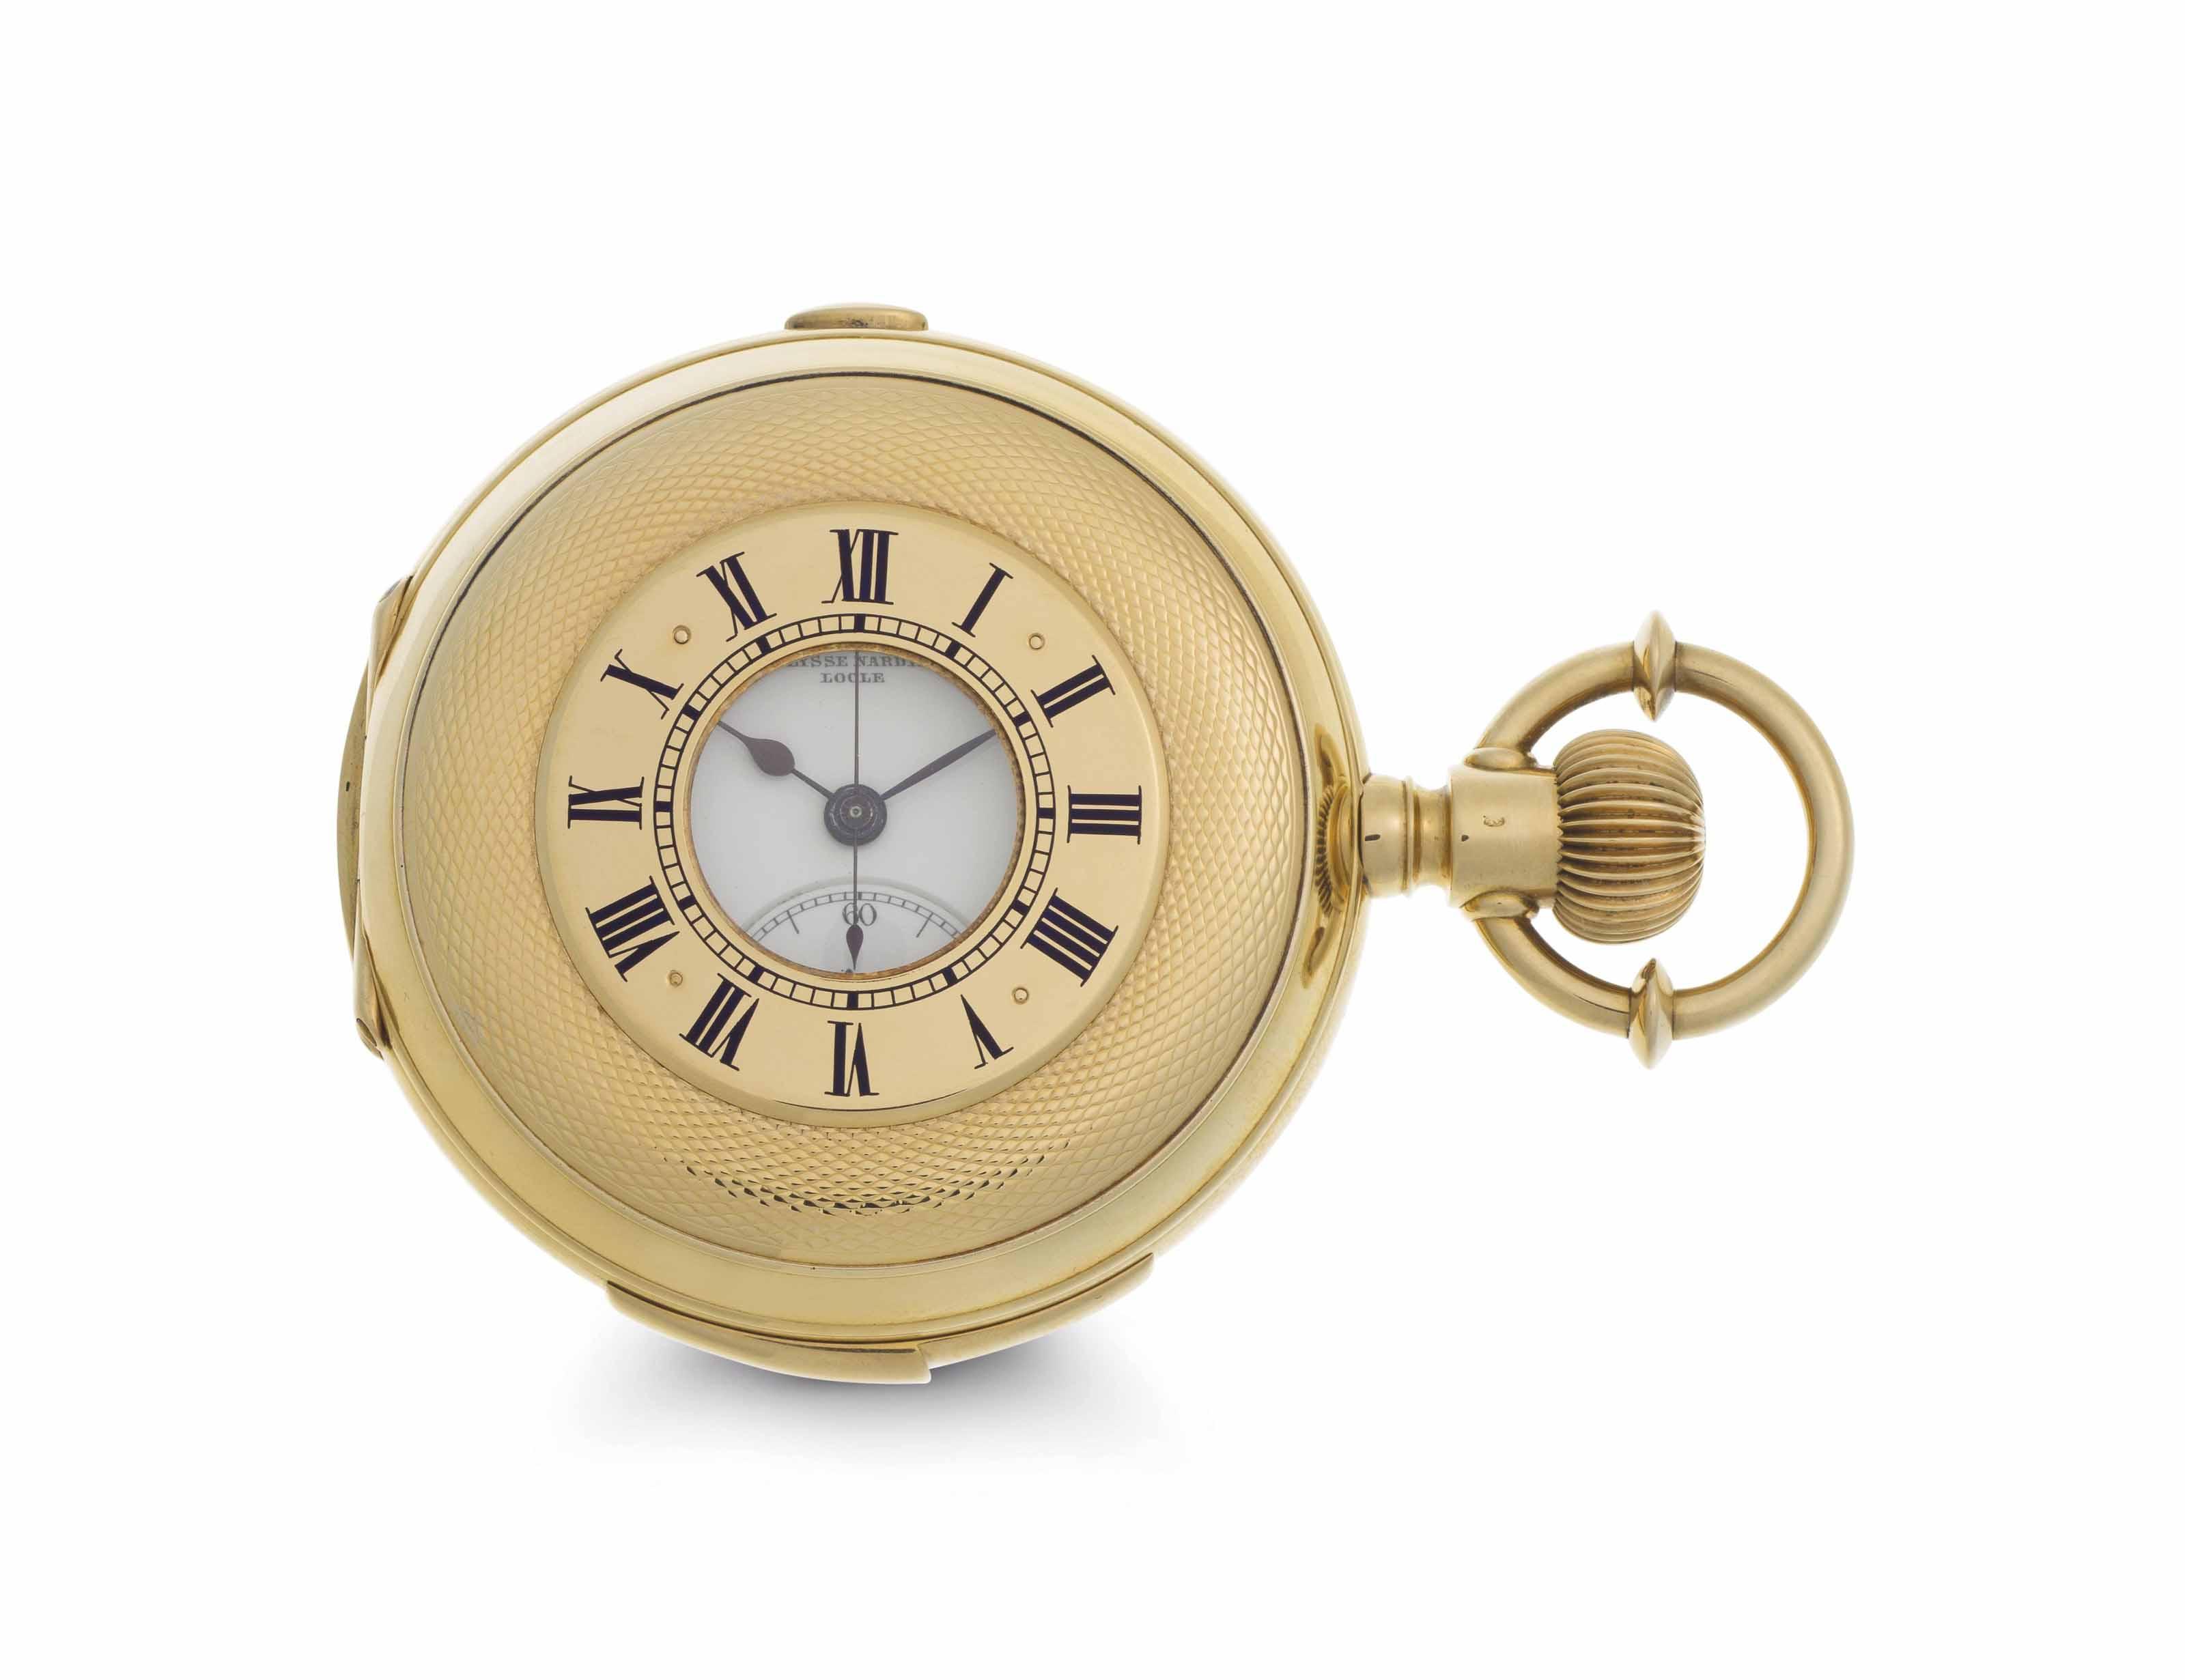 Ulysse Nardin. A Fine 18k Gold and Enamel Minute Repeating Half-Hunter Case Chronograph Keyless Lever Pocket Watch